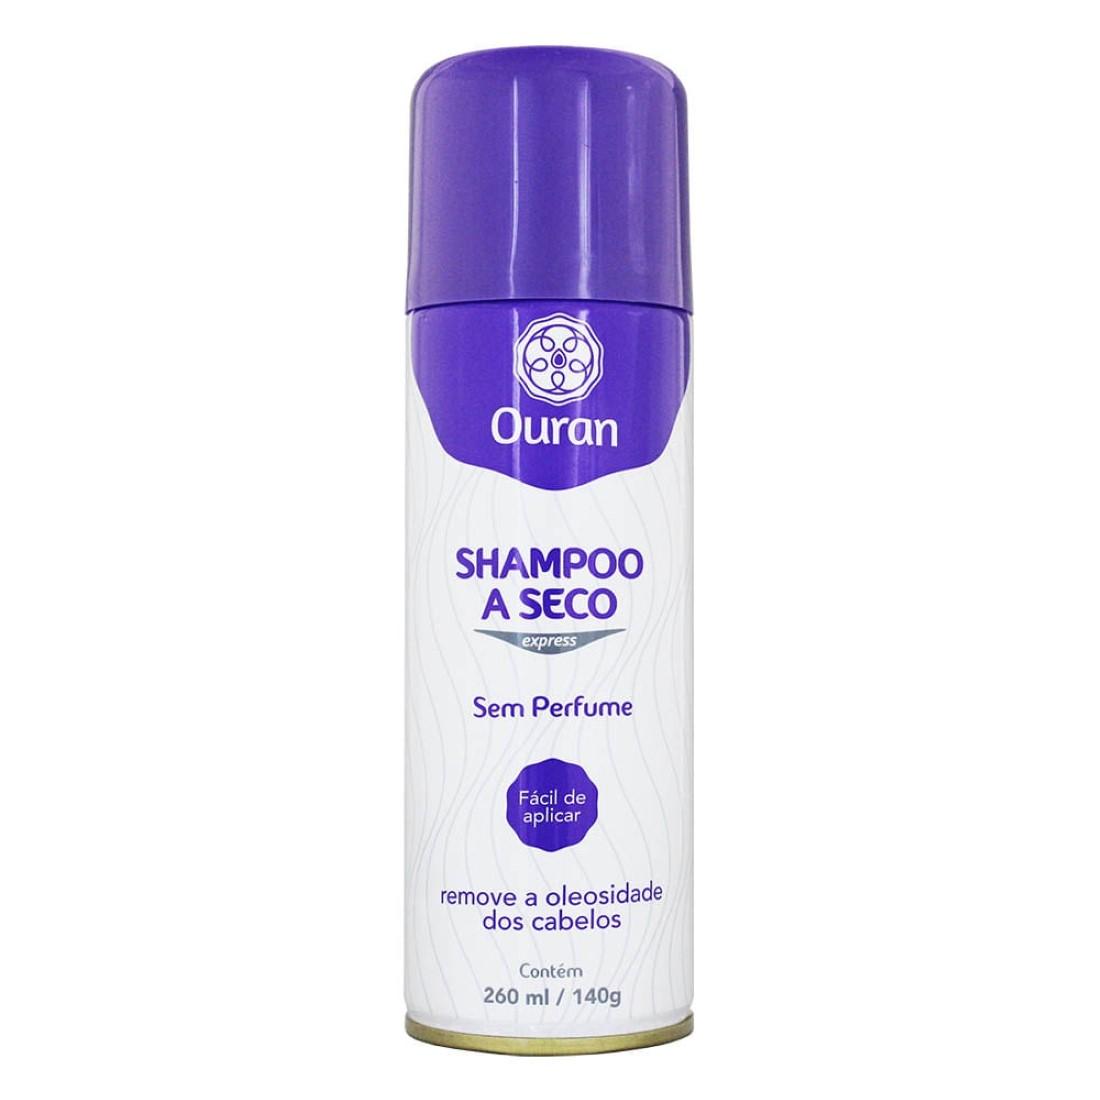 Shampoo a Seco Express Sem Perfume 260ml - Ouran